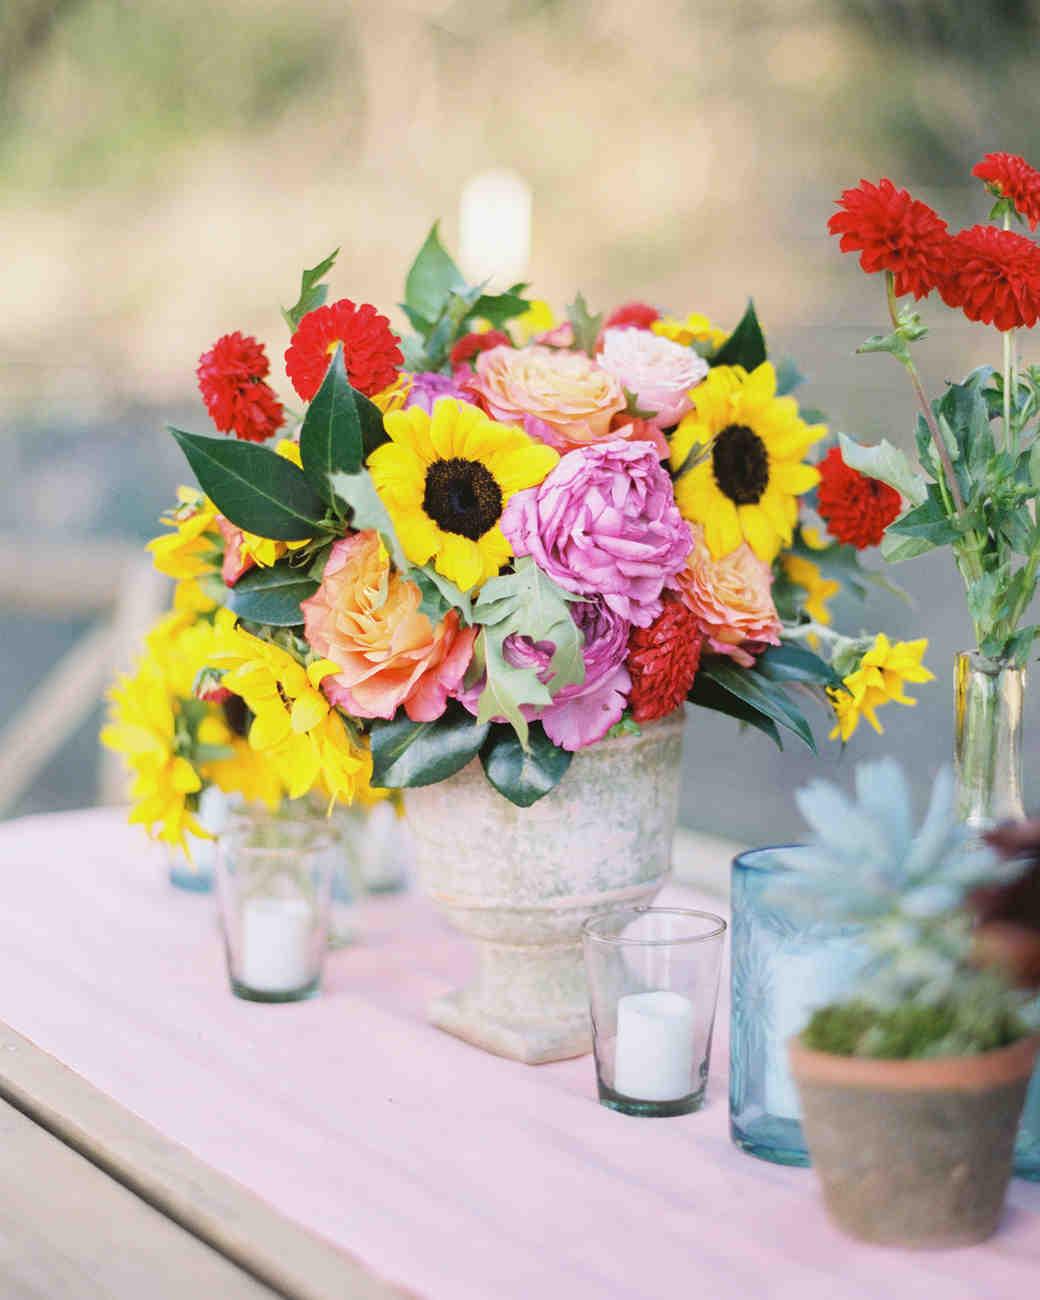 Wedding Flowers For Summer: Stunning Summer Centerpieces Using In-Season Flowers